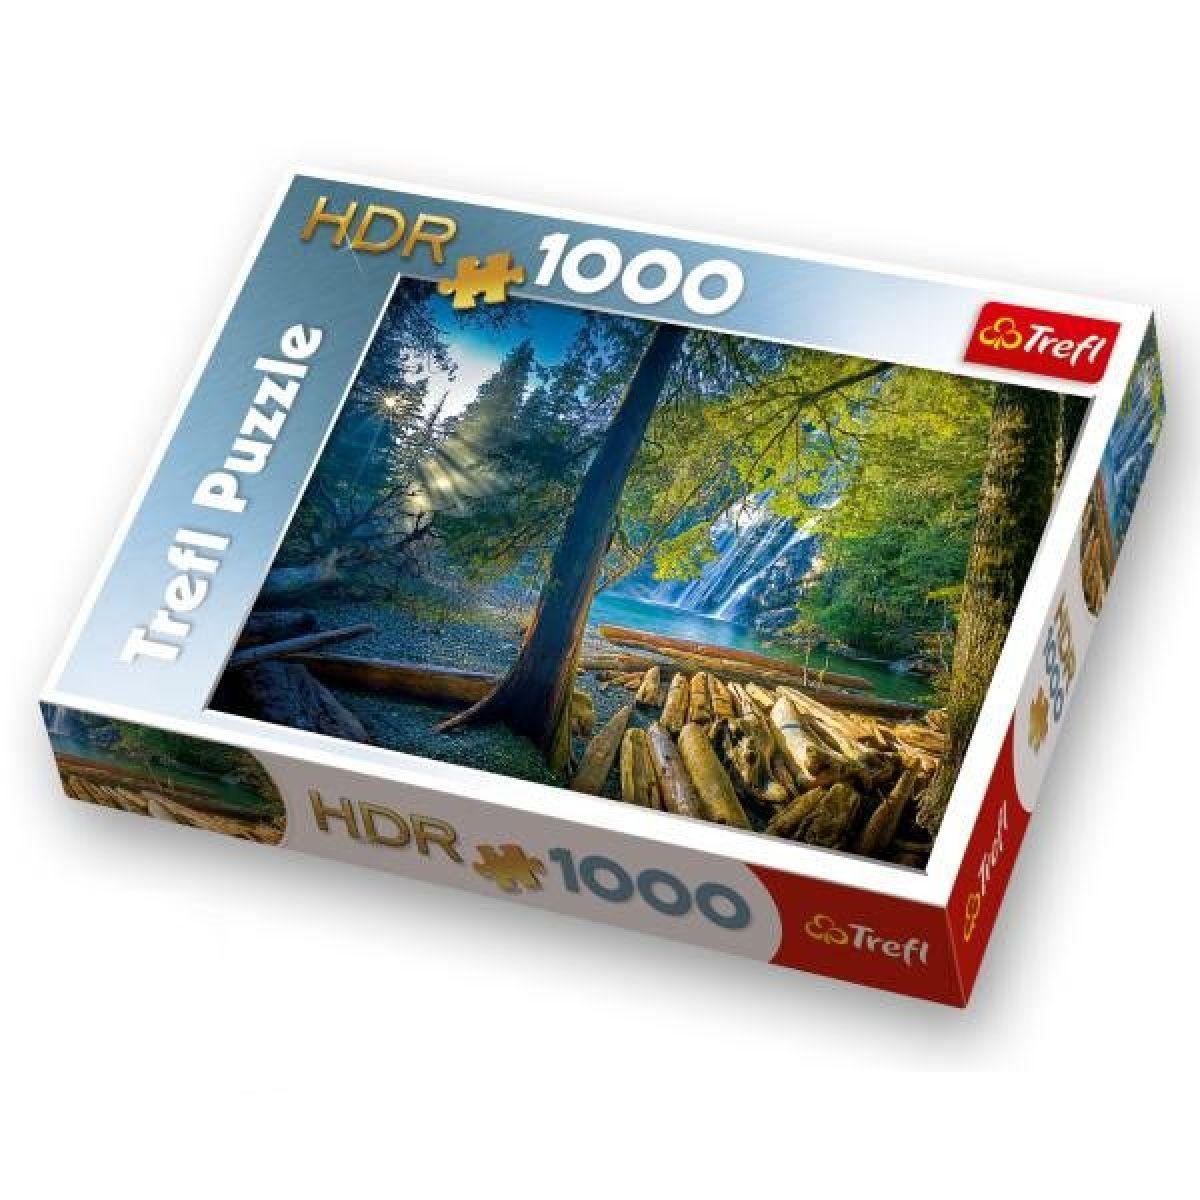 Trefl Puzzle HDR Tajemný les 1000 dílků